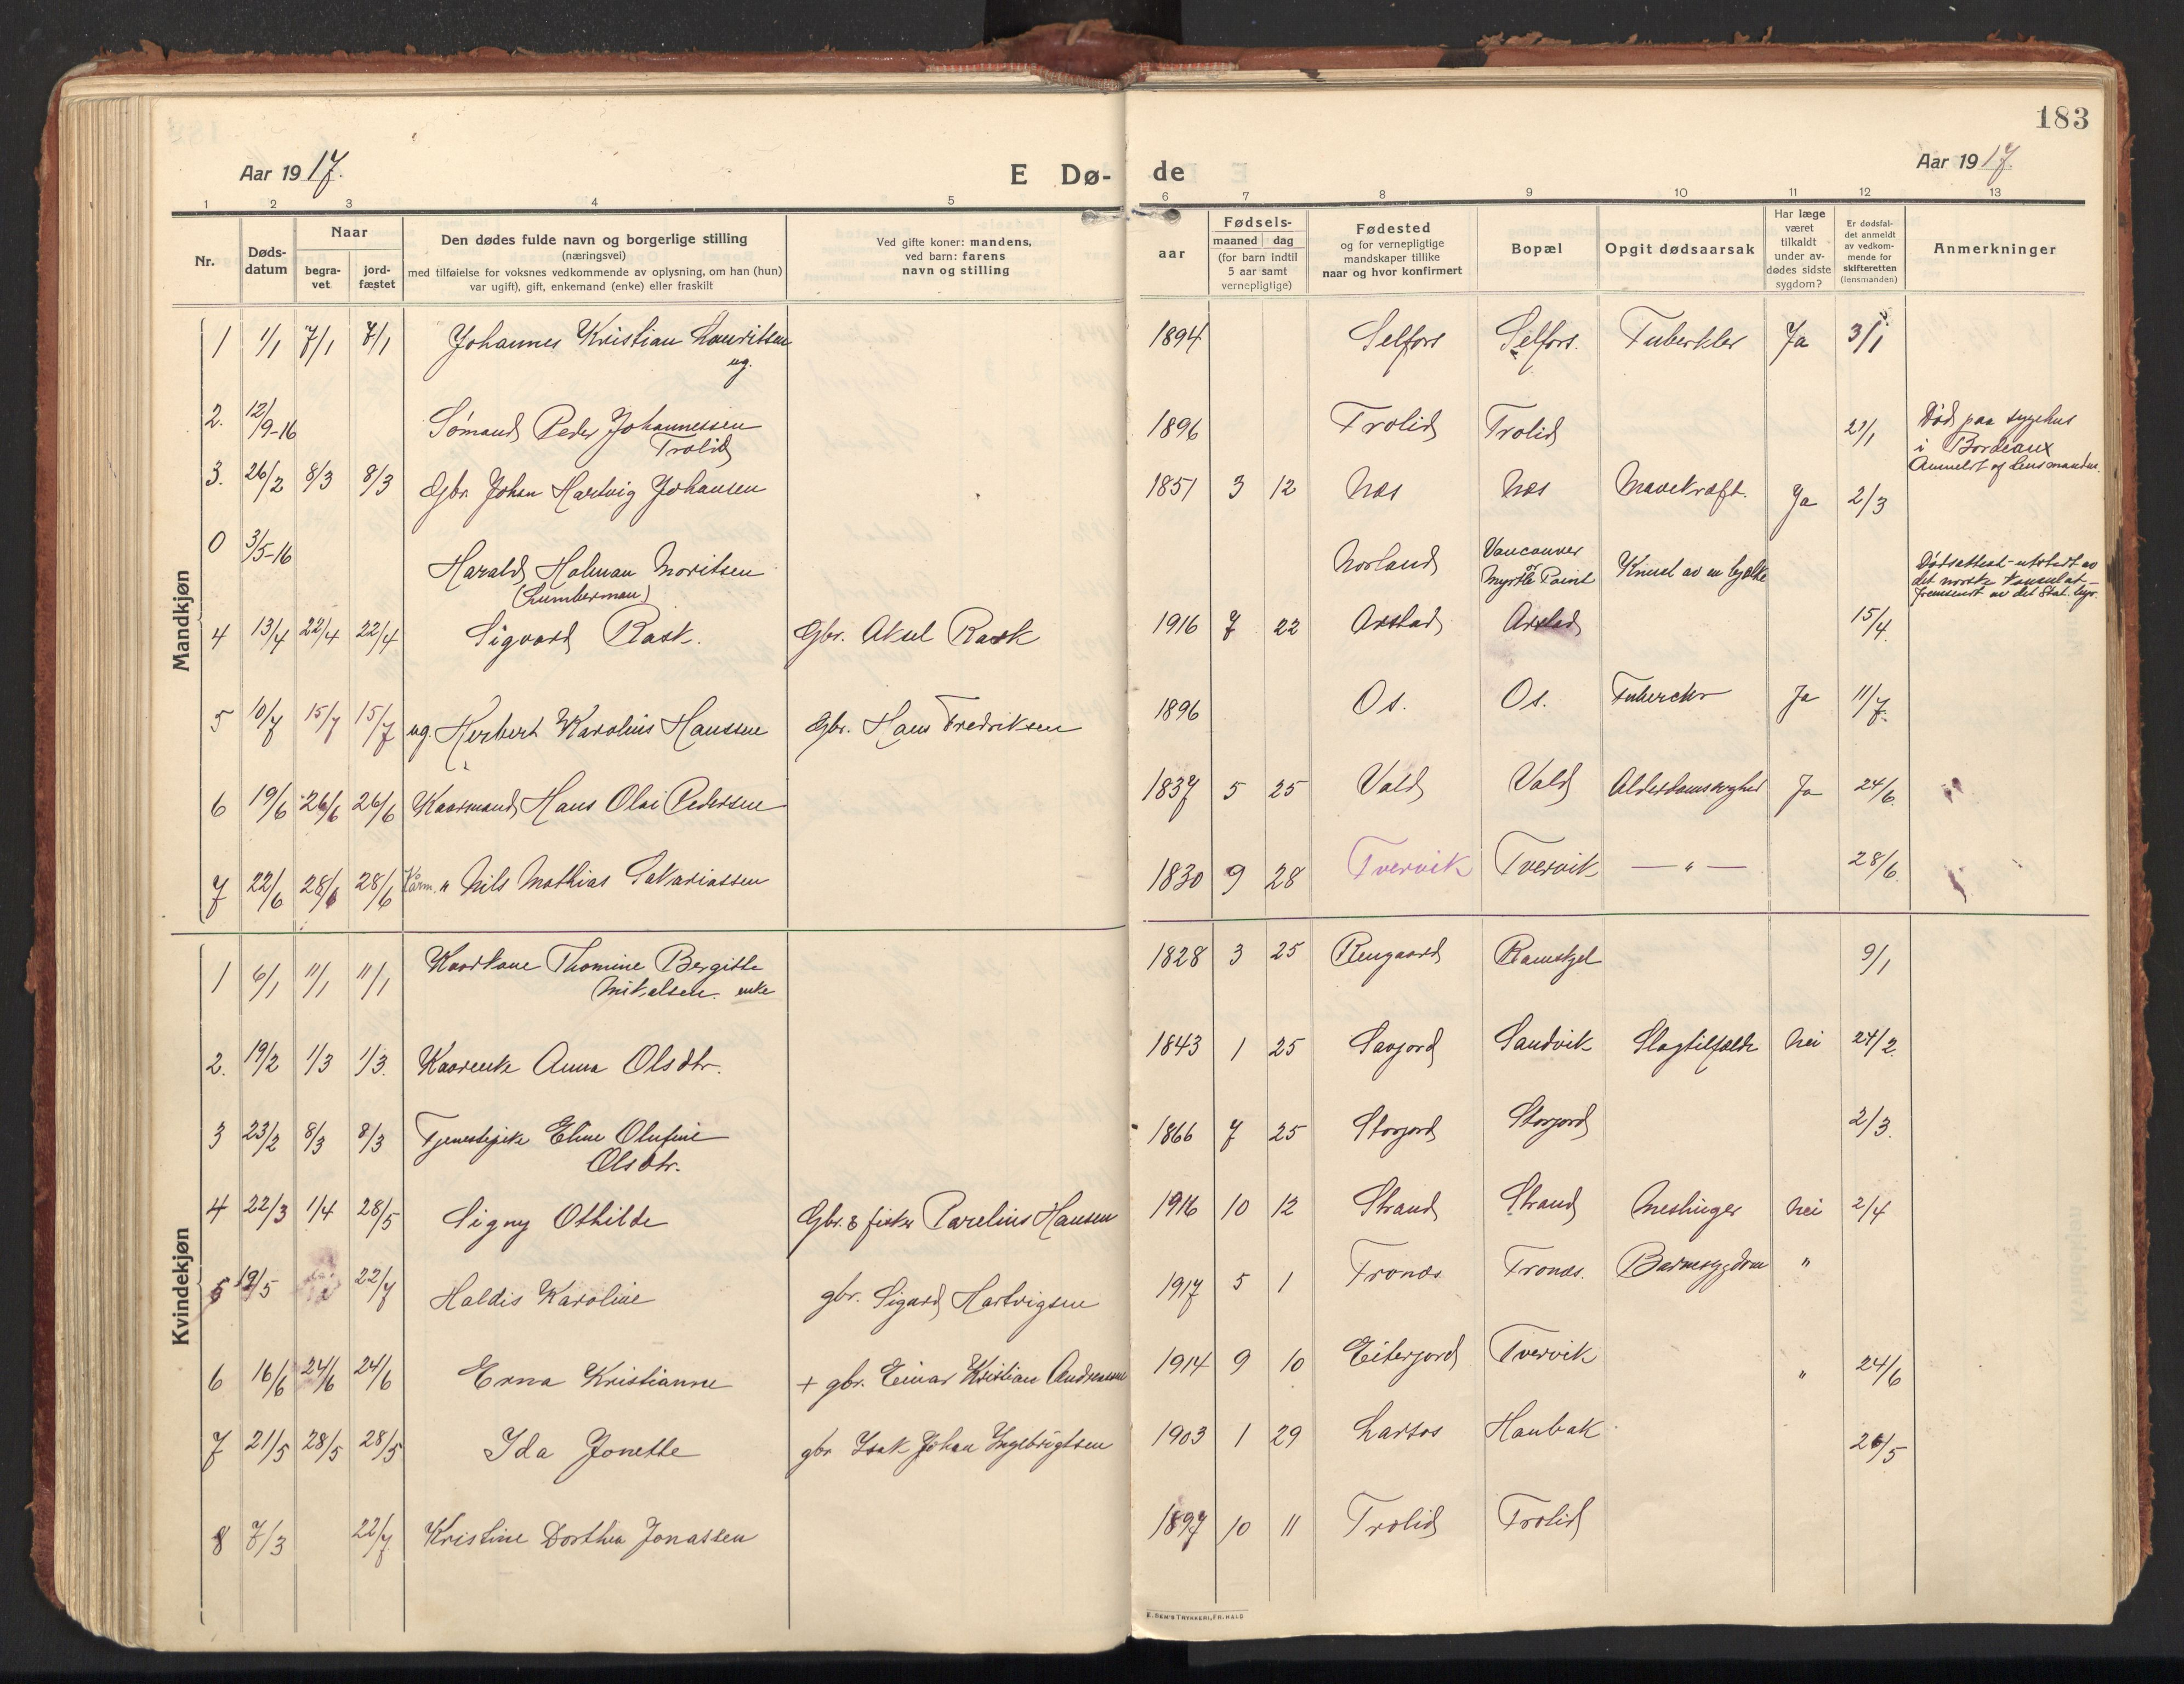 SAT, Ministerialprotokoller, klokkerbøker og fødselsregistre - Nordland, 846/L0650: Ministerialbok nr. 846A08, 1916-1935, s. 183